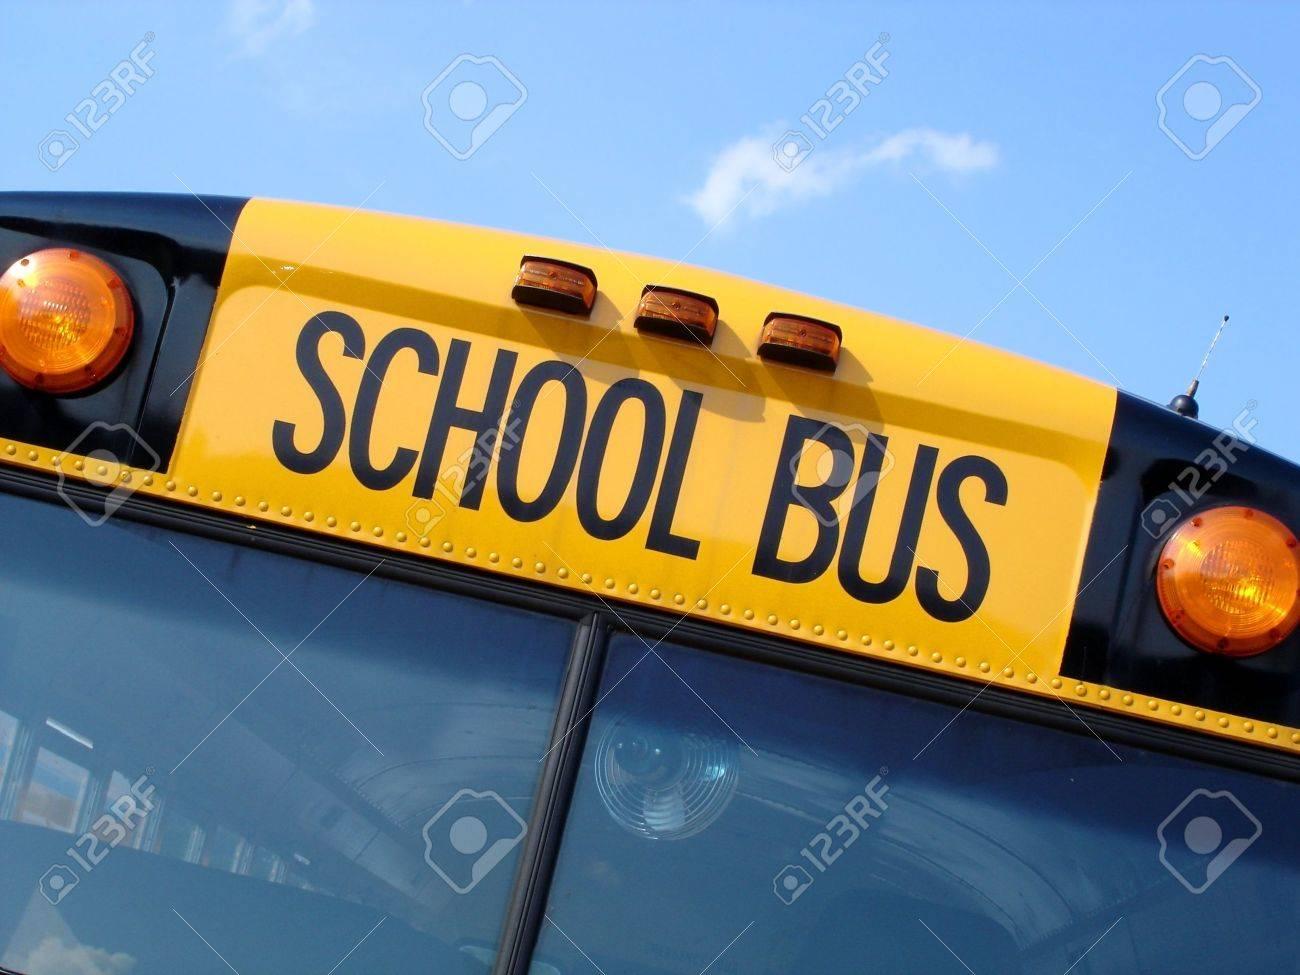 School Bus Top Stock Photo - 3556220